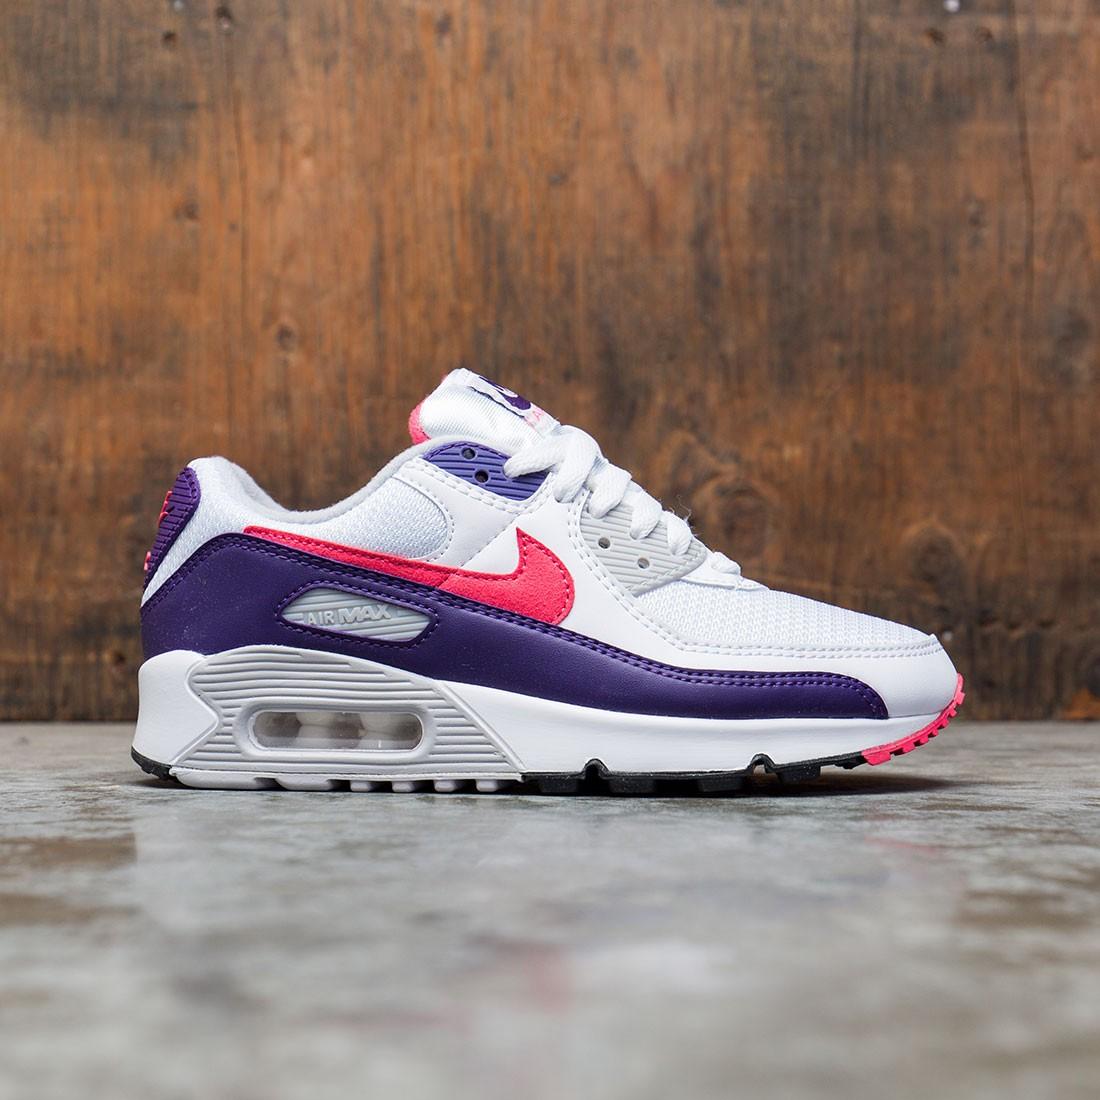 Nike Women Air Max Iii (white / eggplant-flare-zen grey)